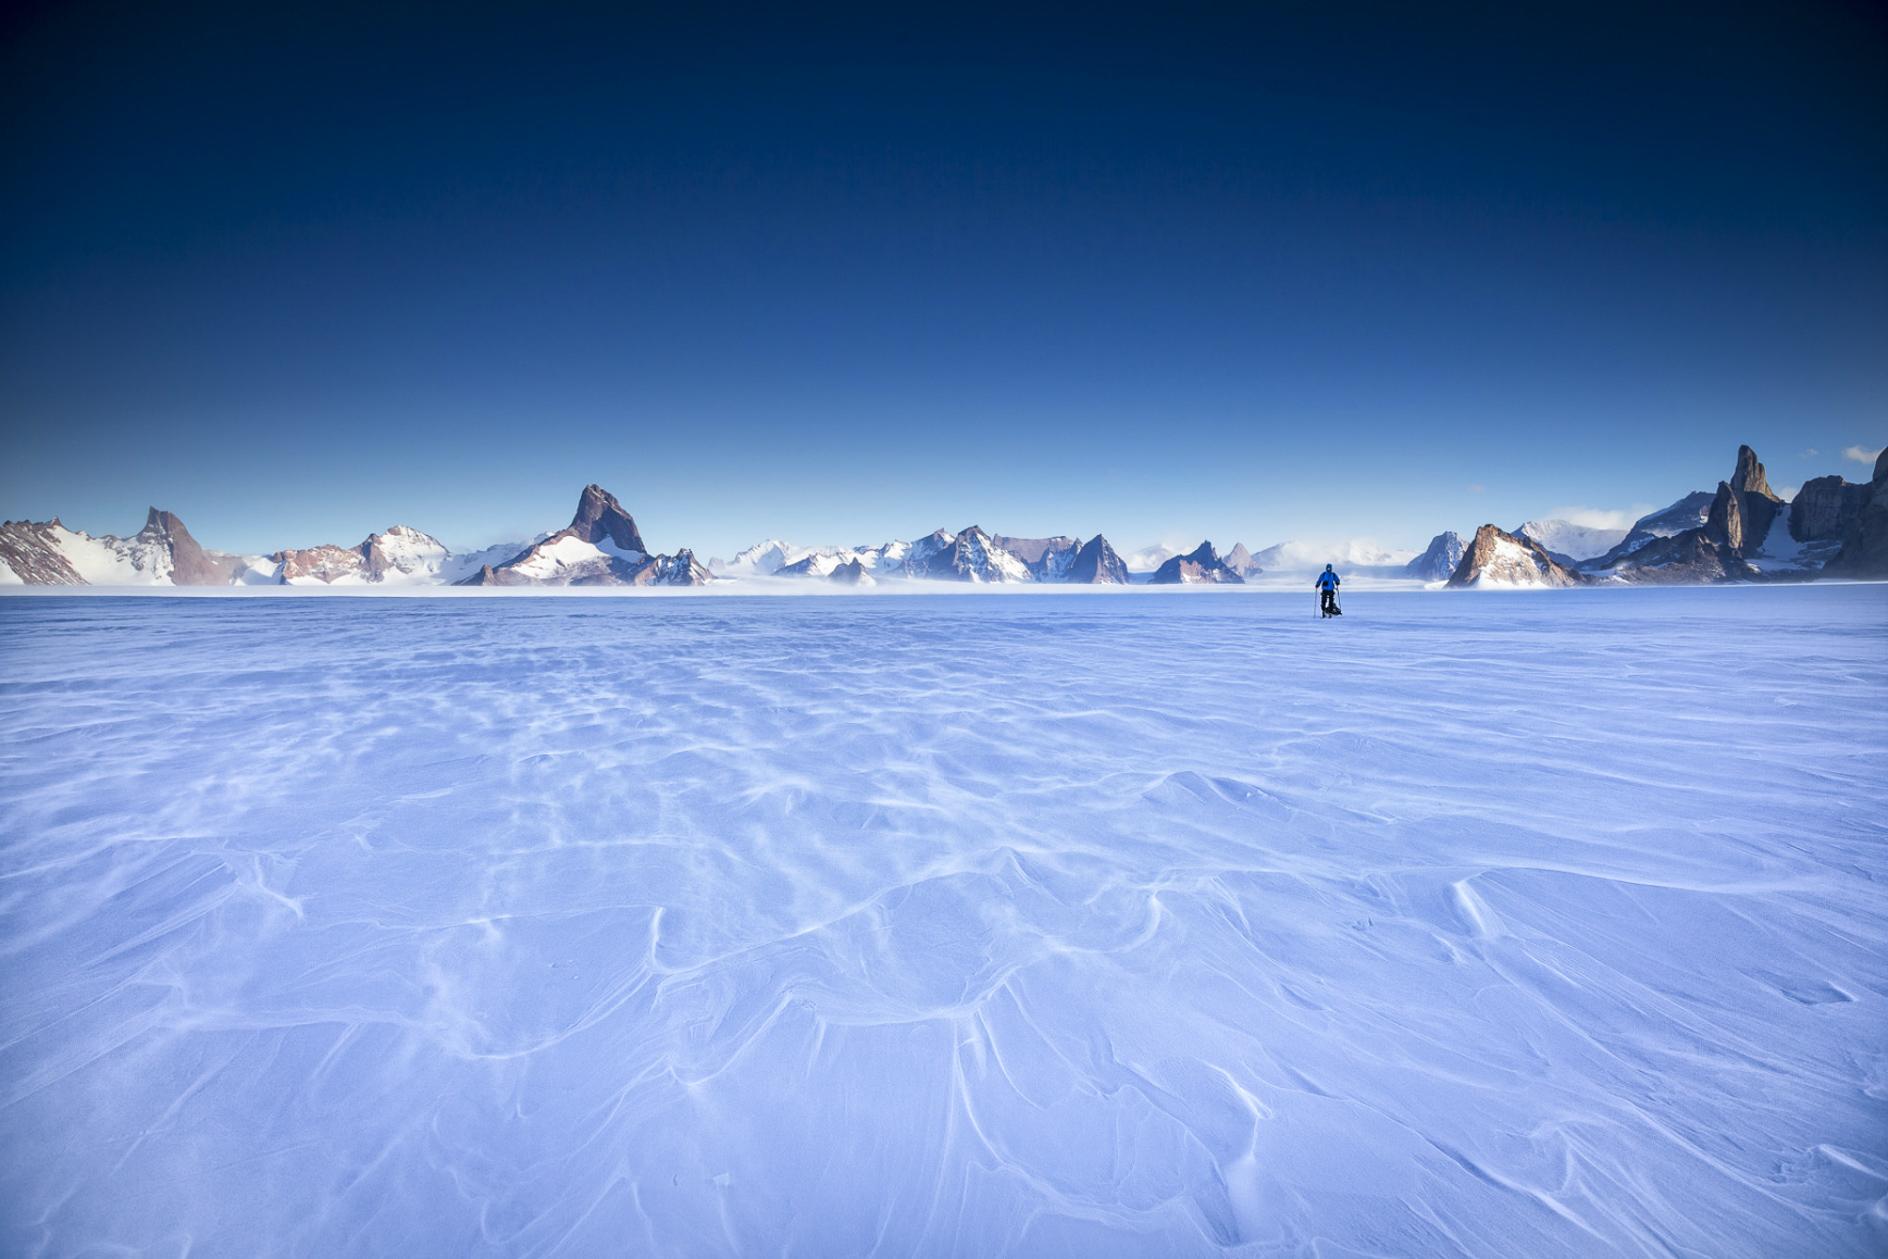 Cory-Richards-Photographer-Antarctica-1.jpg